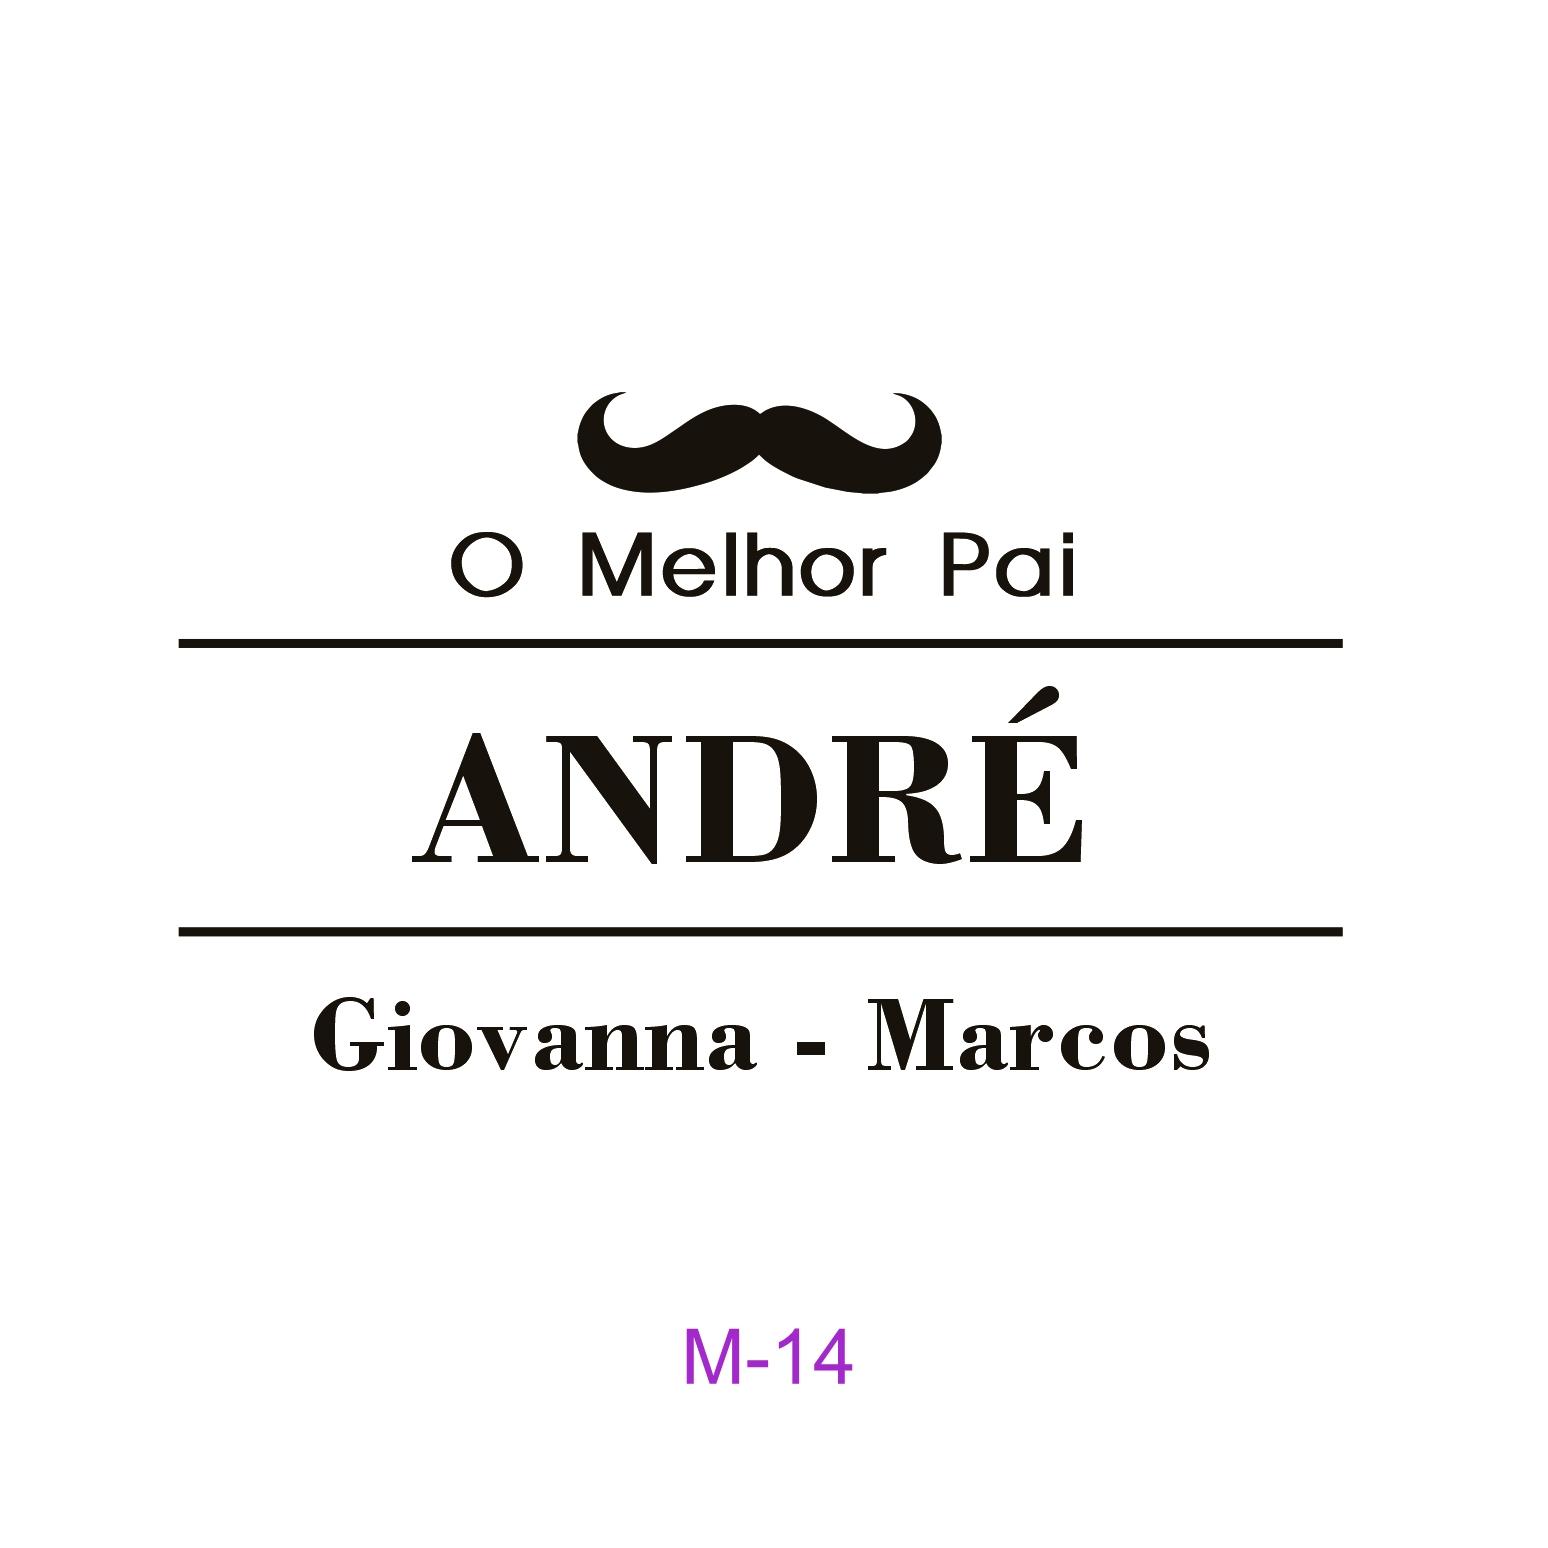 KIT CHURRASCO 3 PEÇAS + SACOLA